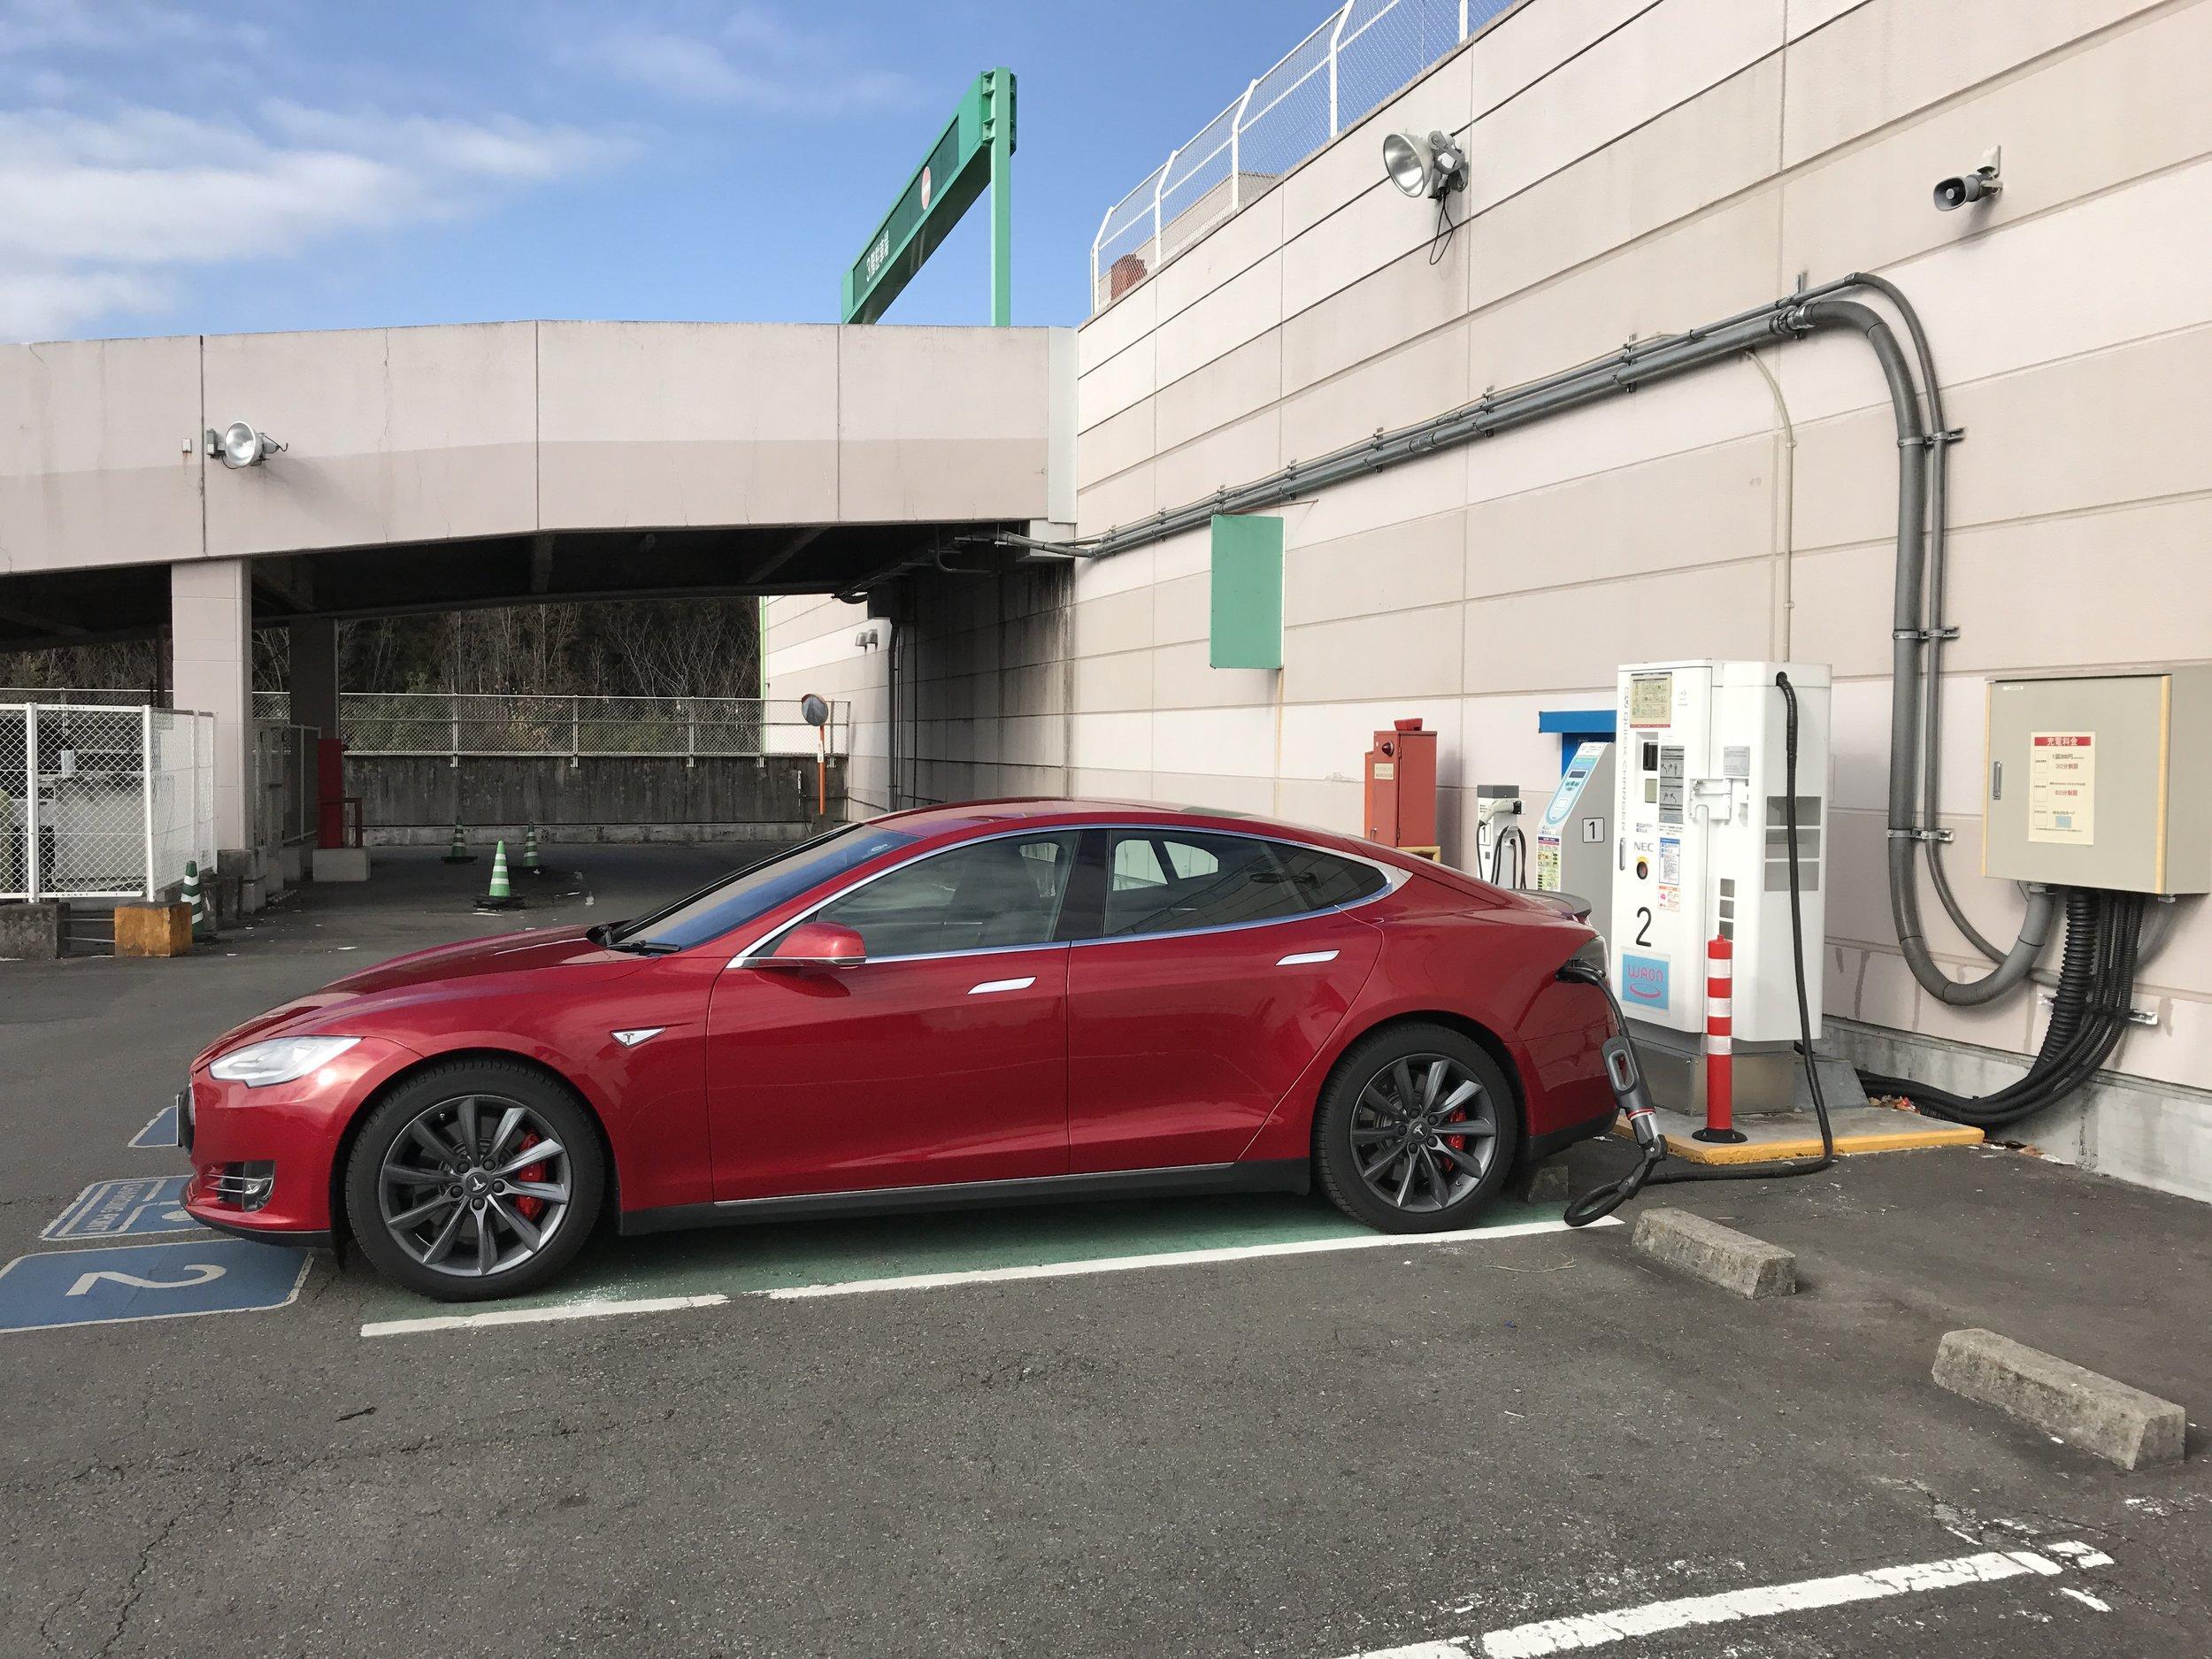 50 kW CHAdeMO at Aeon mall near Nikko